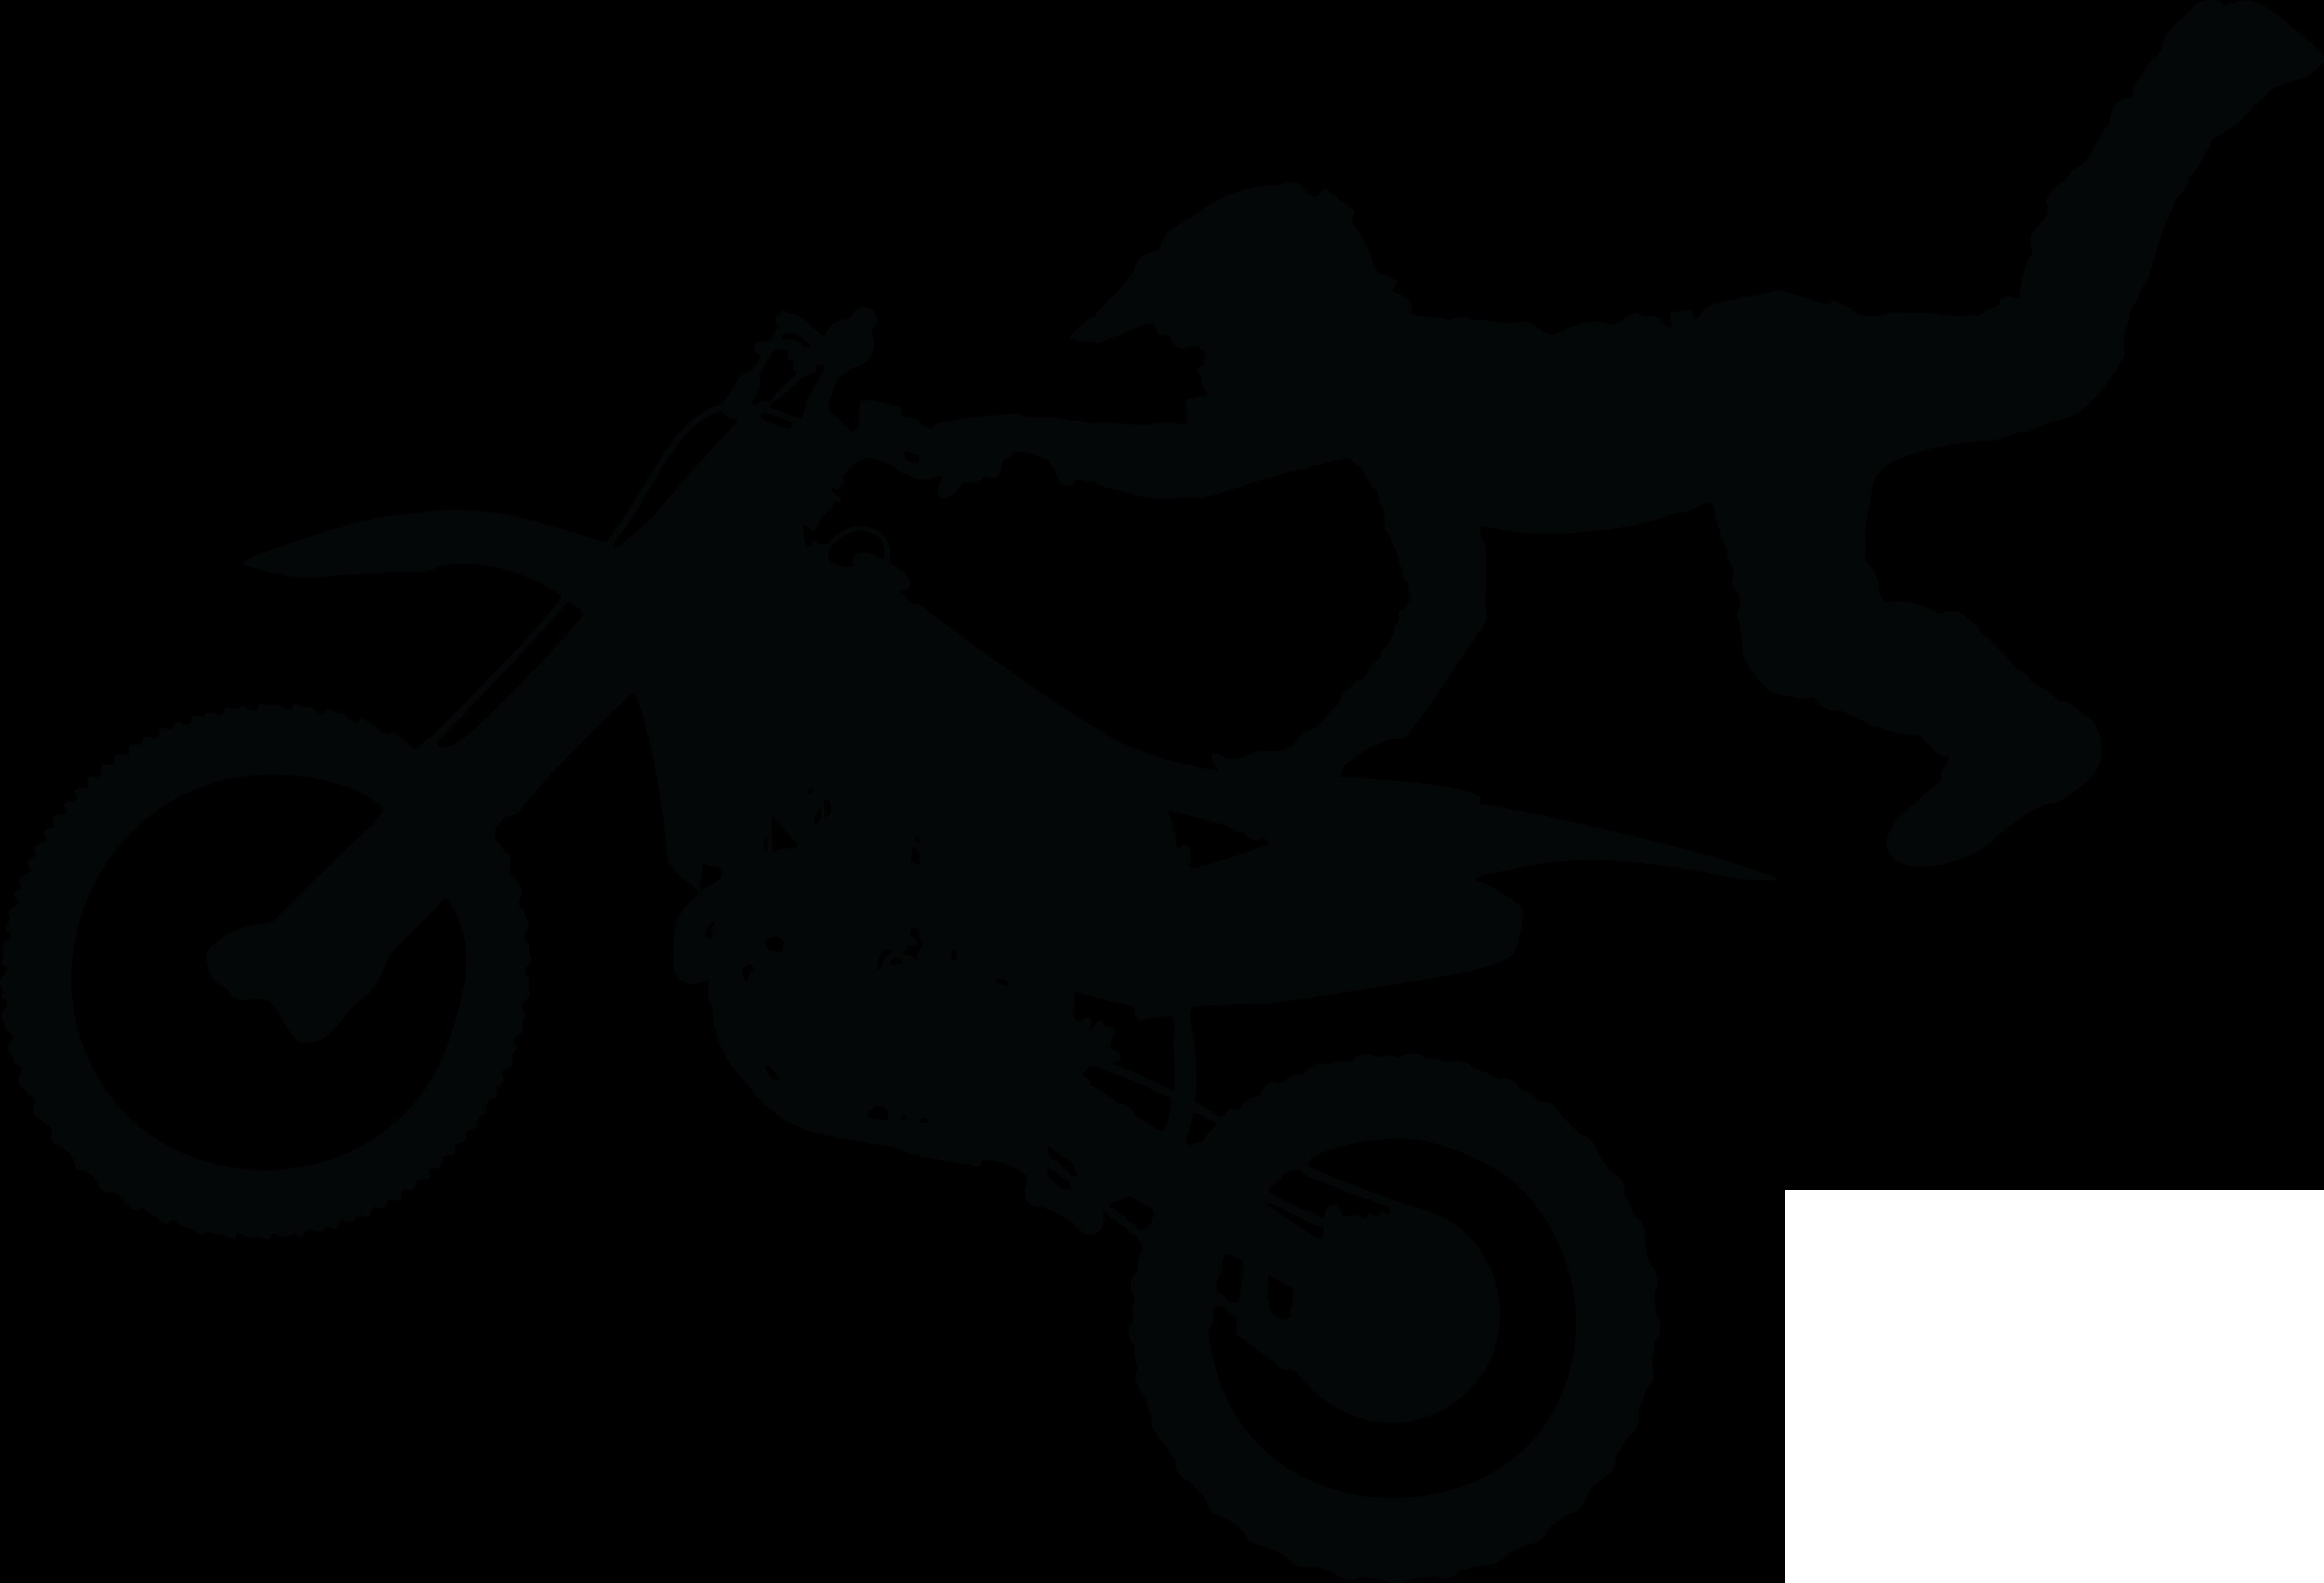 Motocross bike clipart jpg black and white Dirt Bike PNG Free Transparent Dirt Bike.PNG Images.   PlusPNG jpg black and white